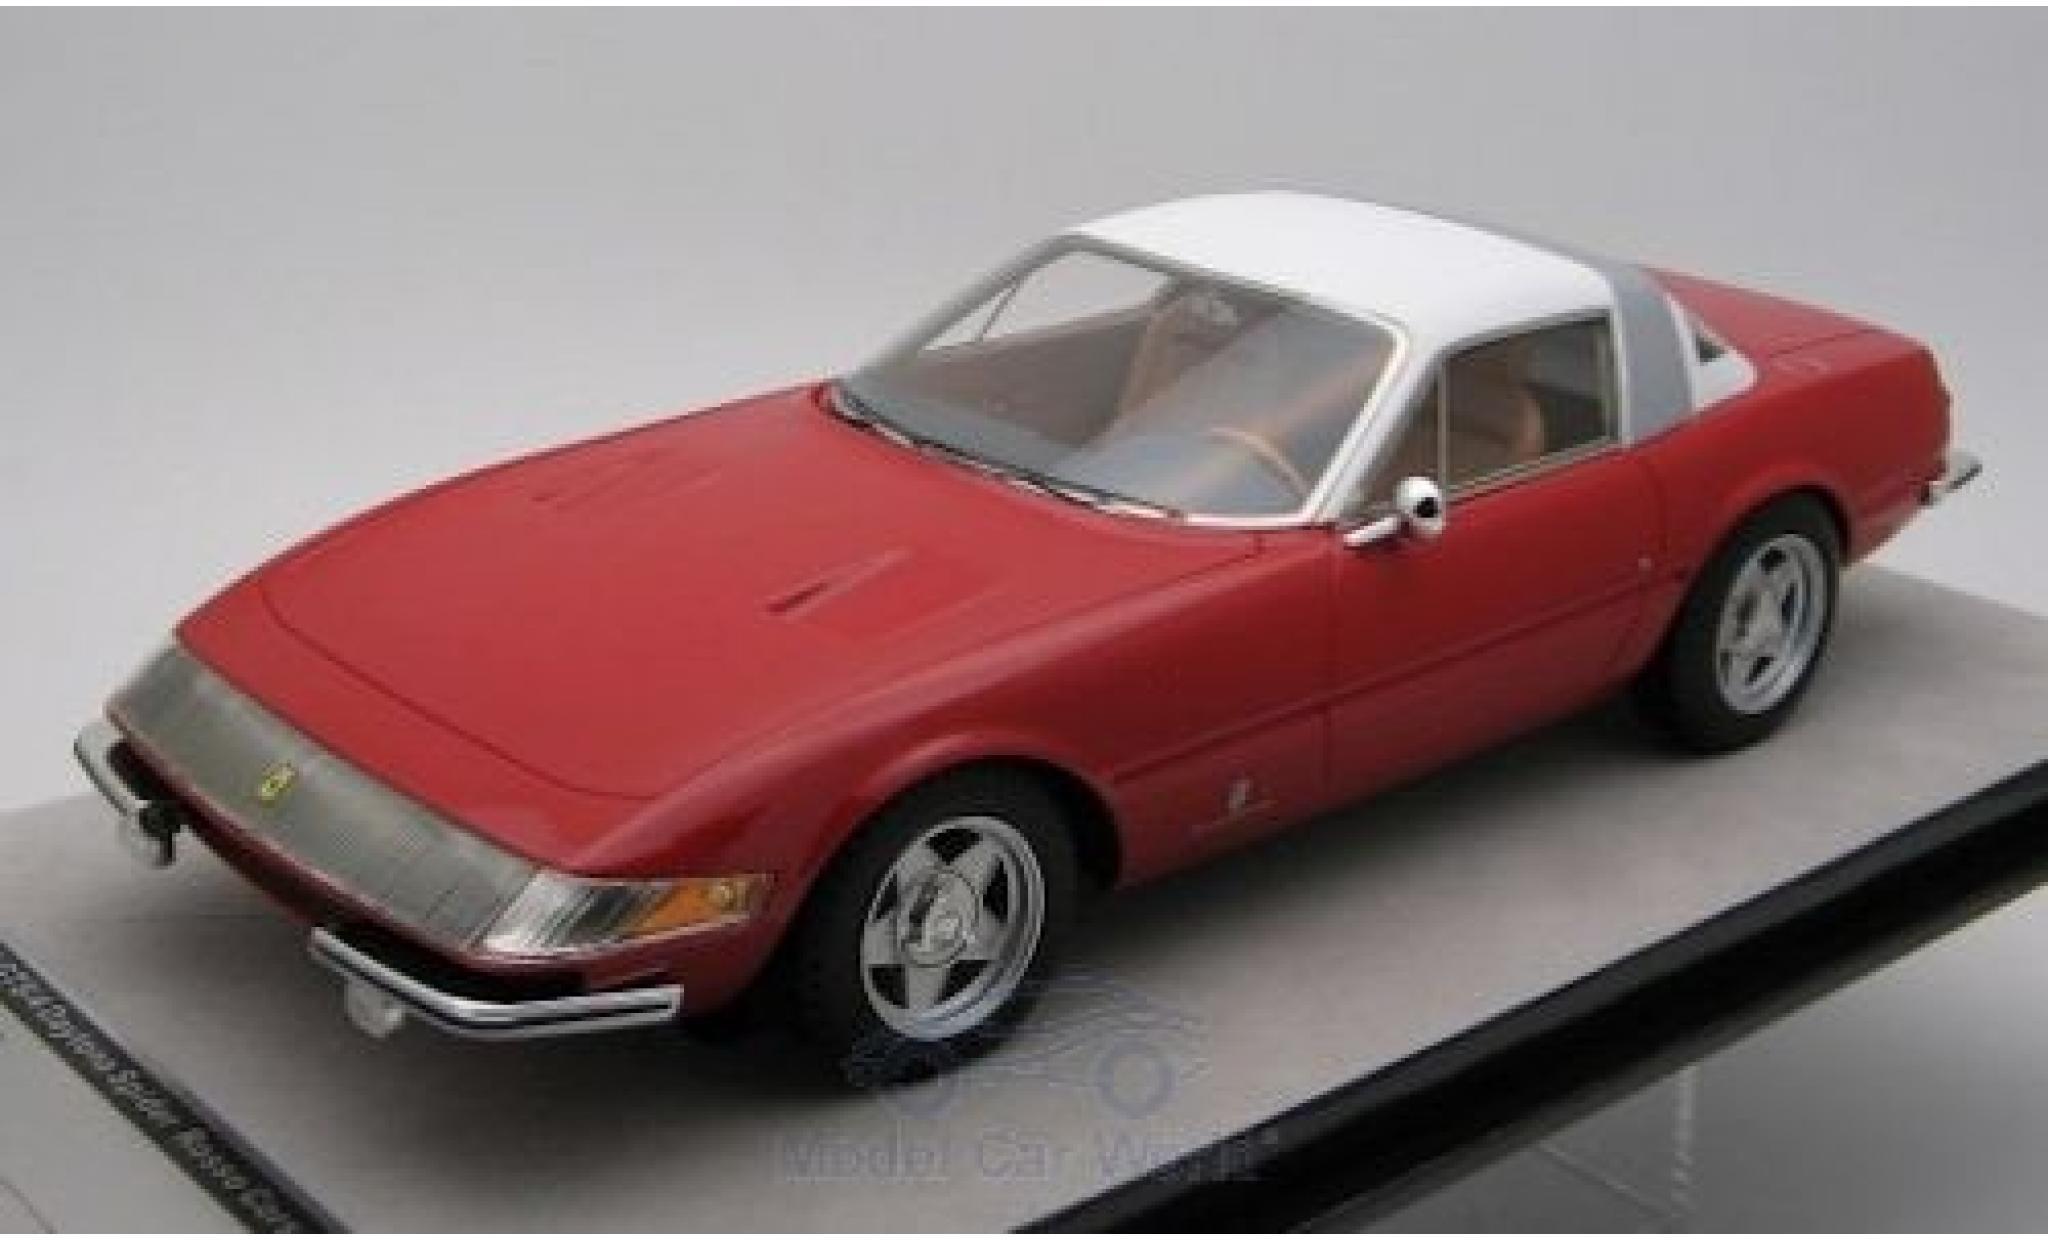 Ferrari 365 1/18 Tecnomodel GTB/4 Daytona Coupe Speciale rouge/blanche 1969